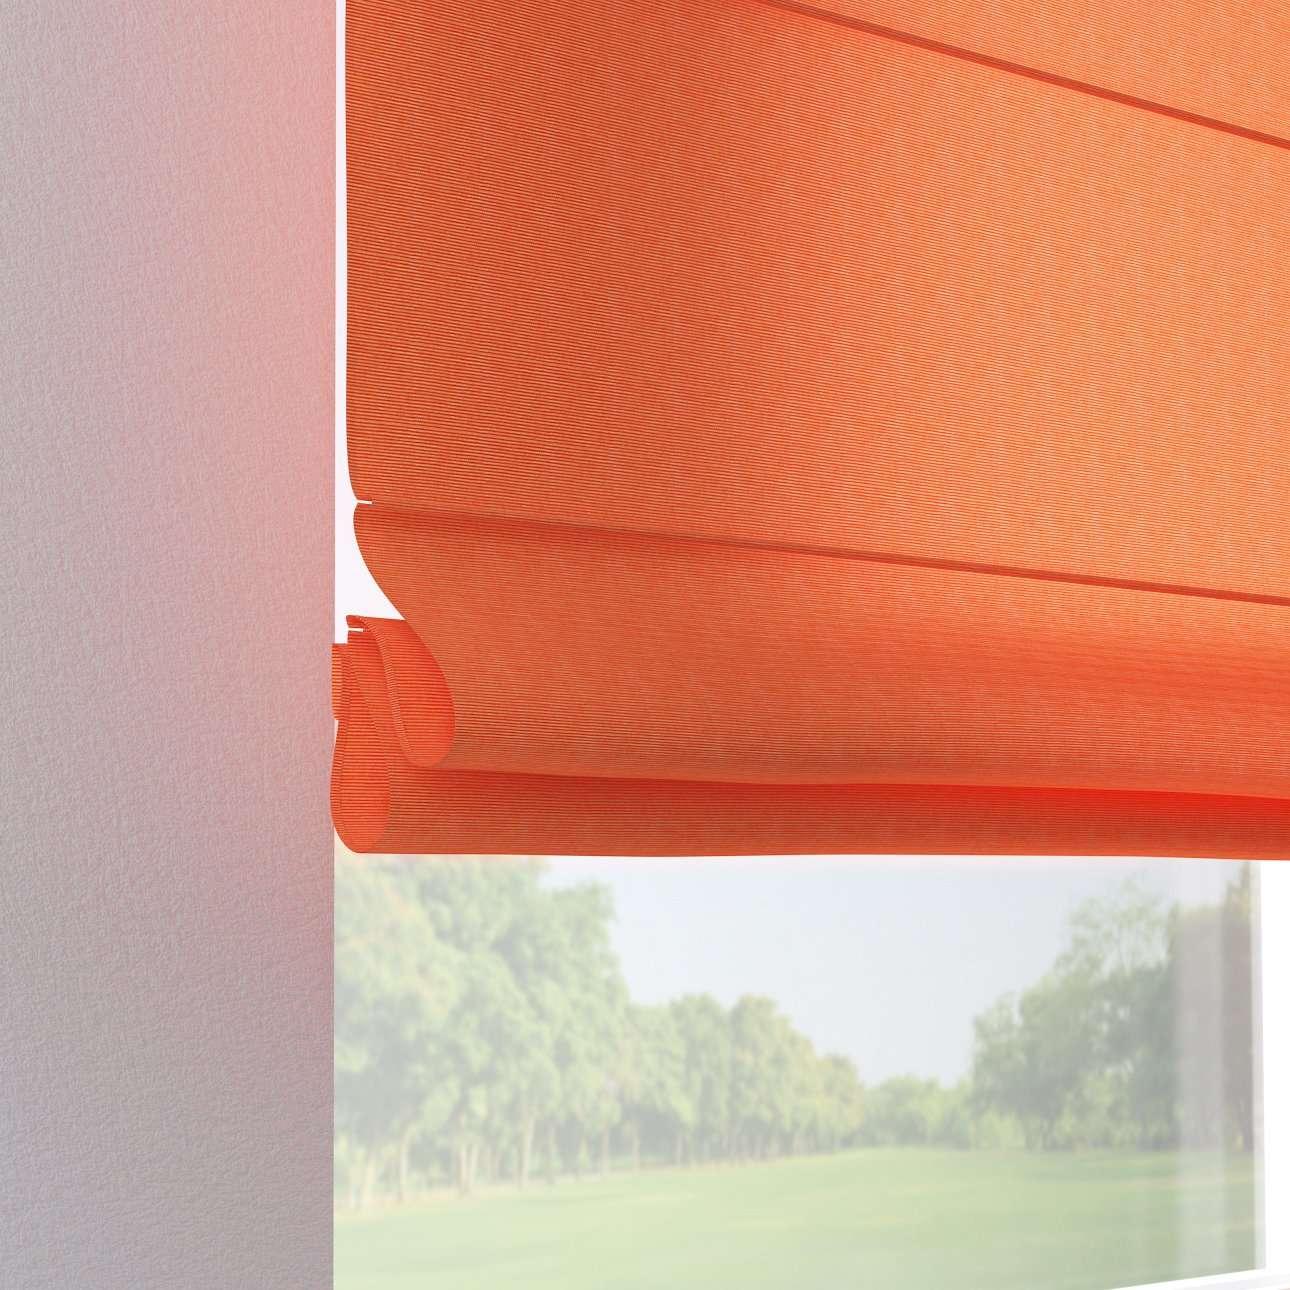 Verona tab top roman blind 80 x 170 cm (31.5 x 67 inch) in collection Jupiter, fabric: 127-35